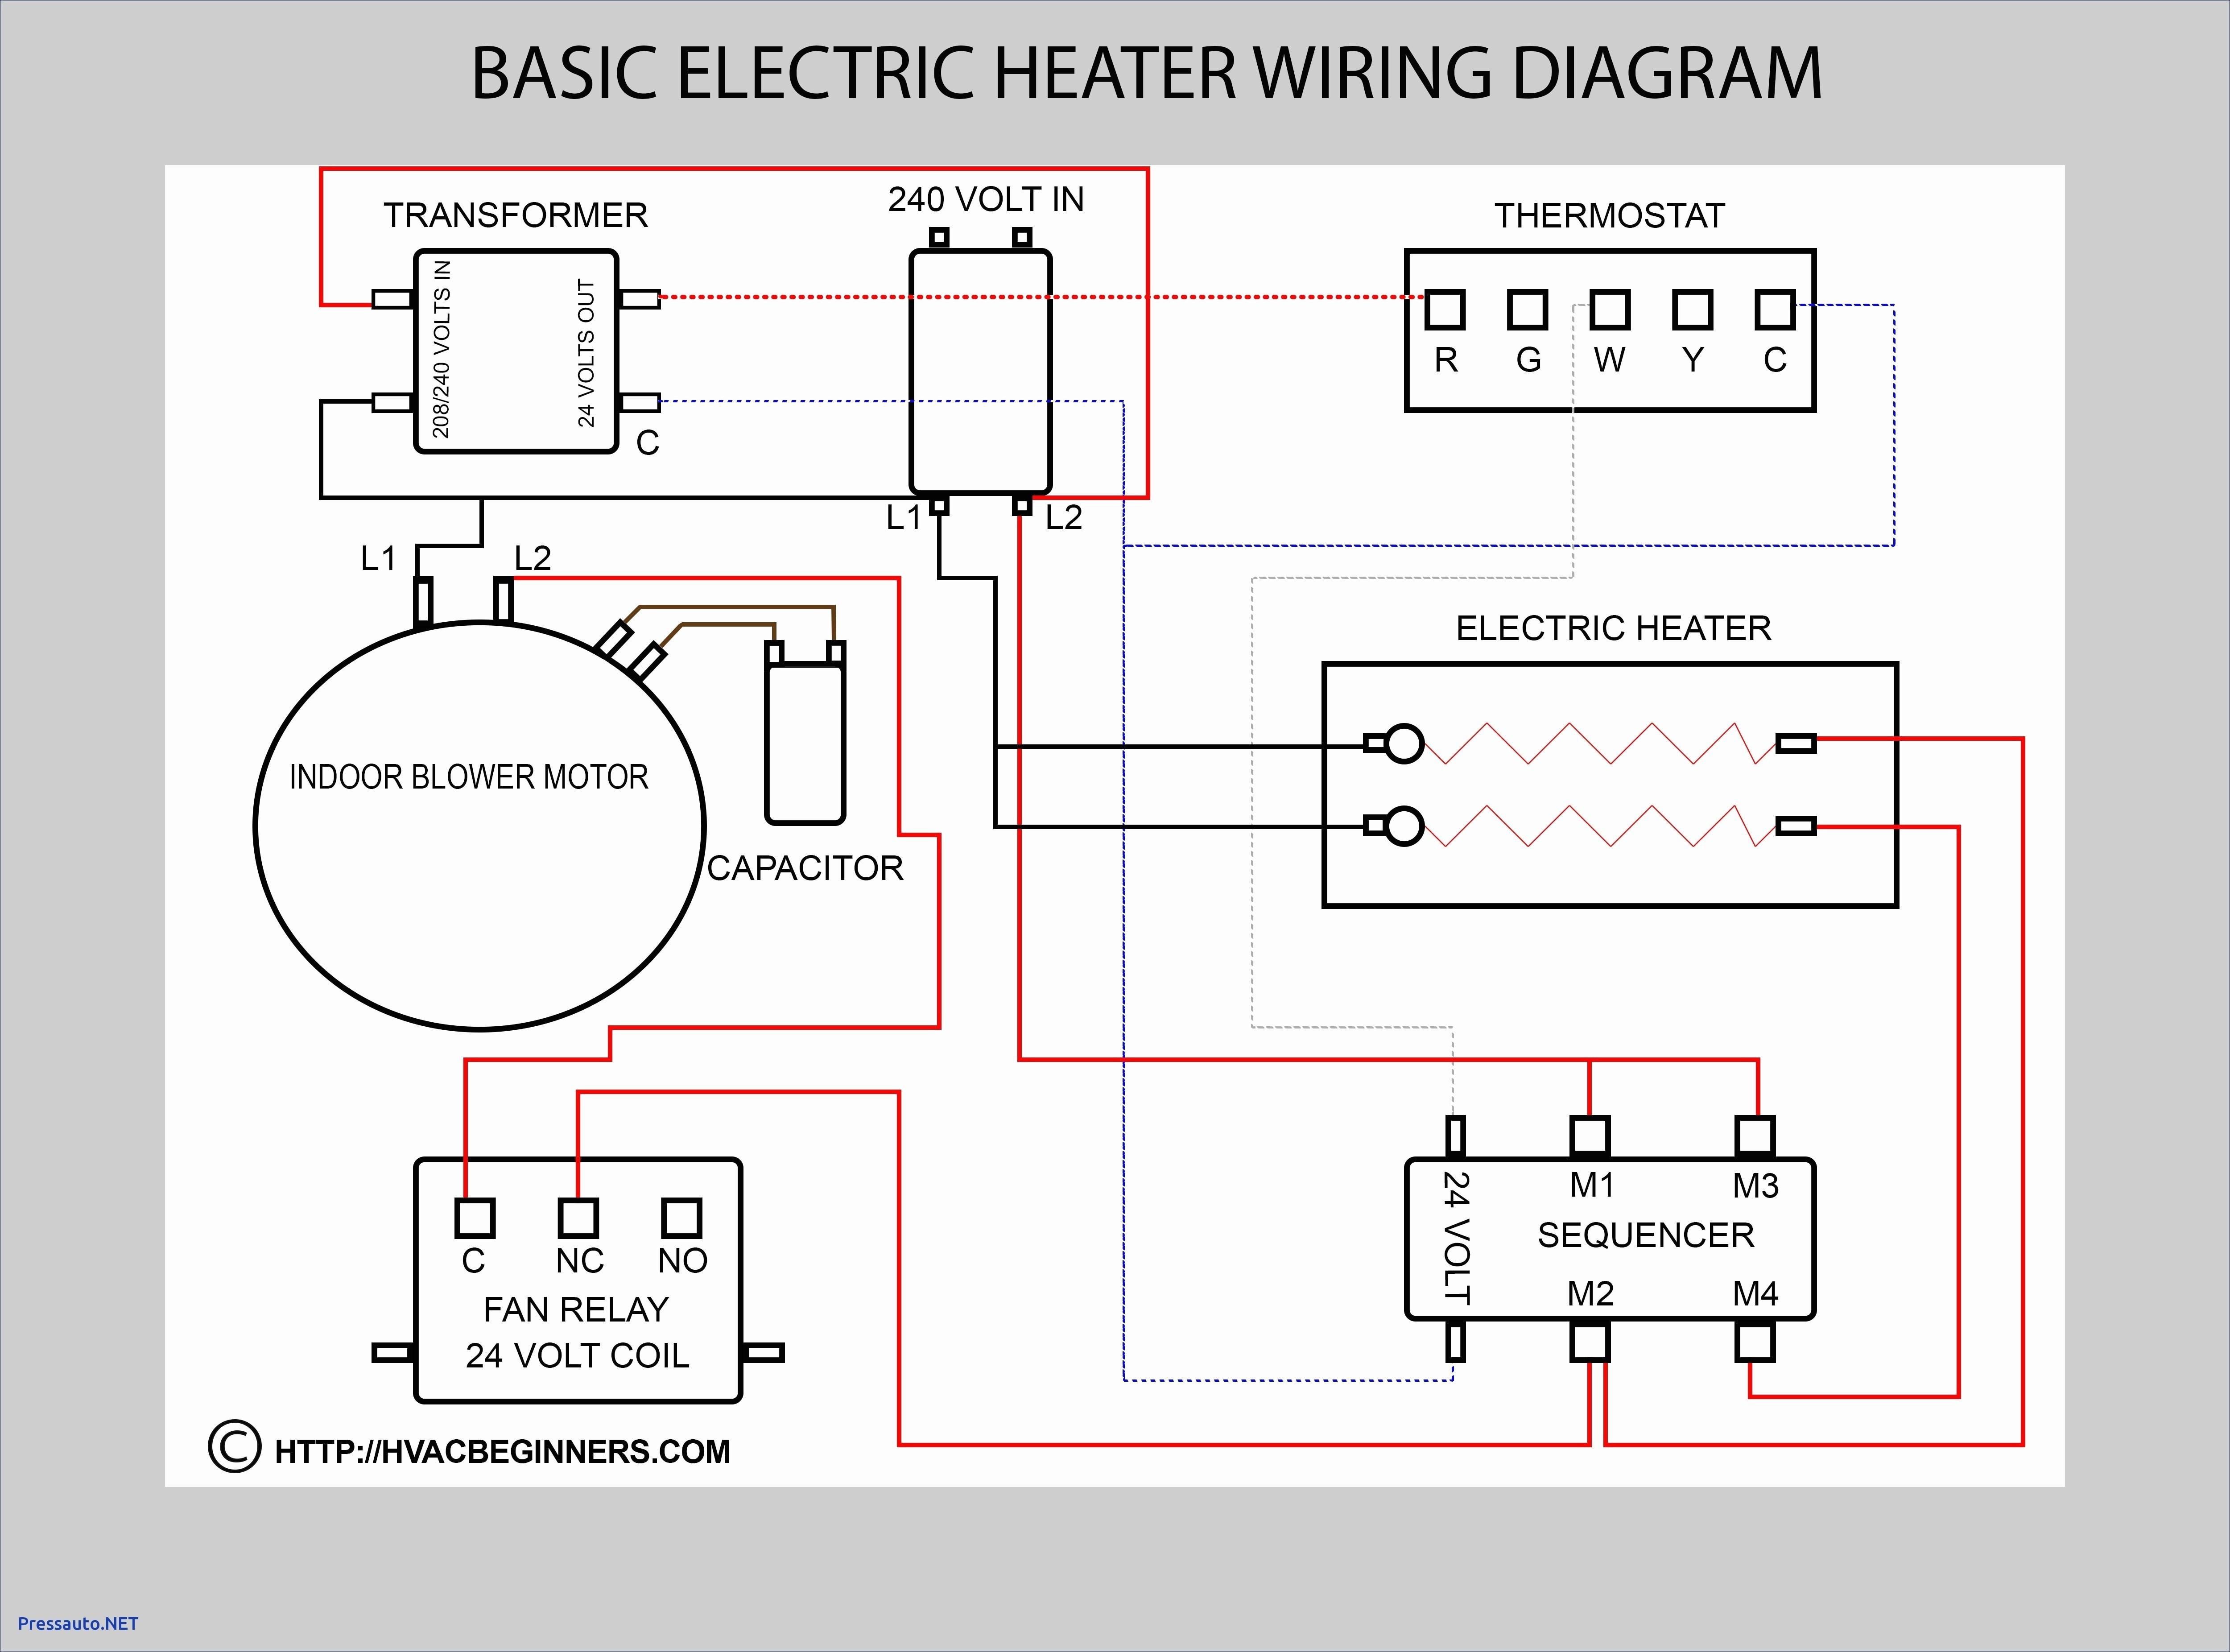 208 Volt Single Phase Wiring Diagram Beautiful Wiring Diagram Motor And 3 Phase To Single Phase Transformer Diagram